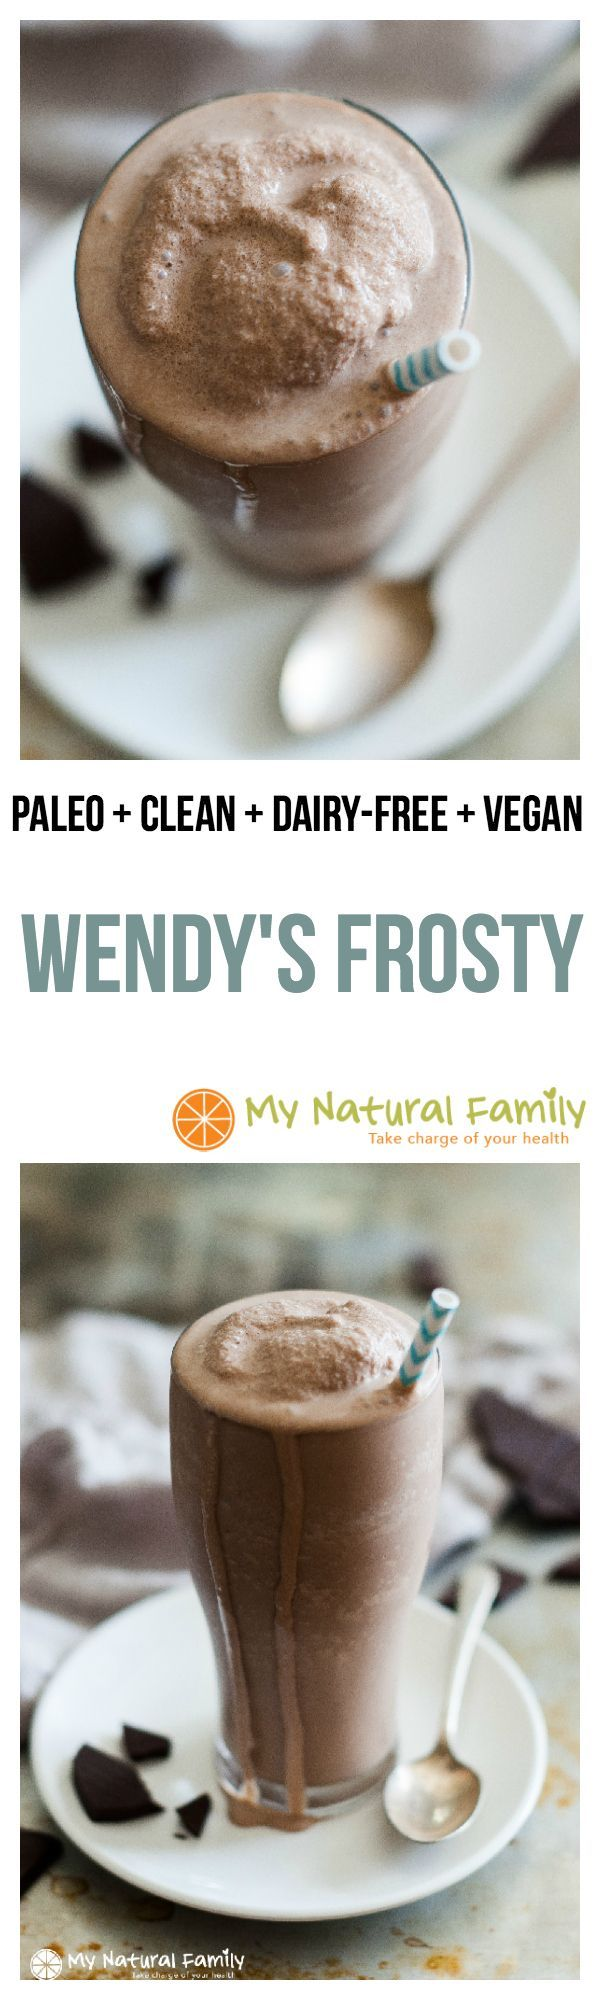 Wendy's Copycat Frosty Recipe {Paleo, Clean Eating, Gluten Free, Dairy-Free}